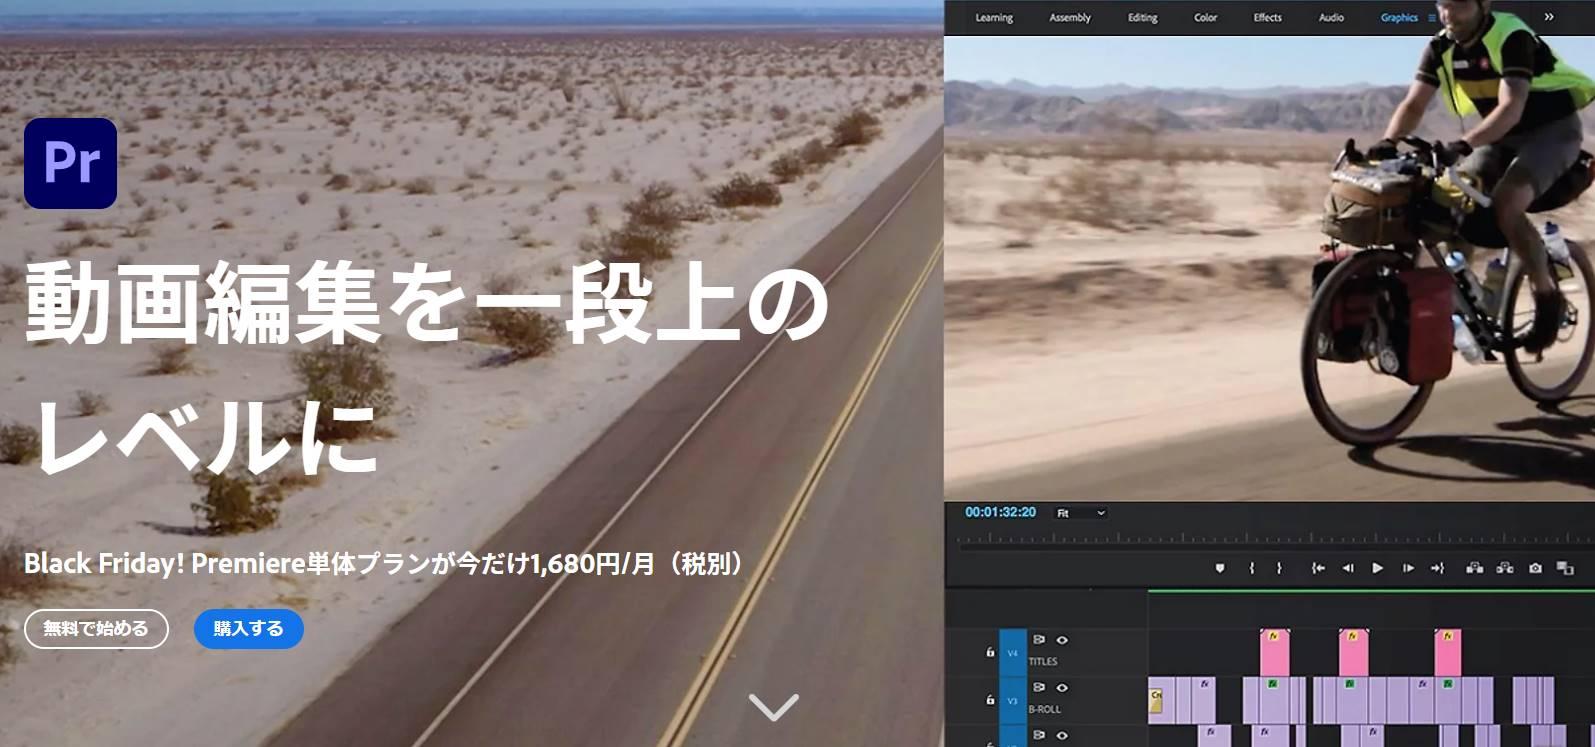 Premiere Pro(プレミアプロ)